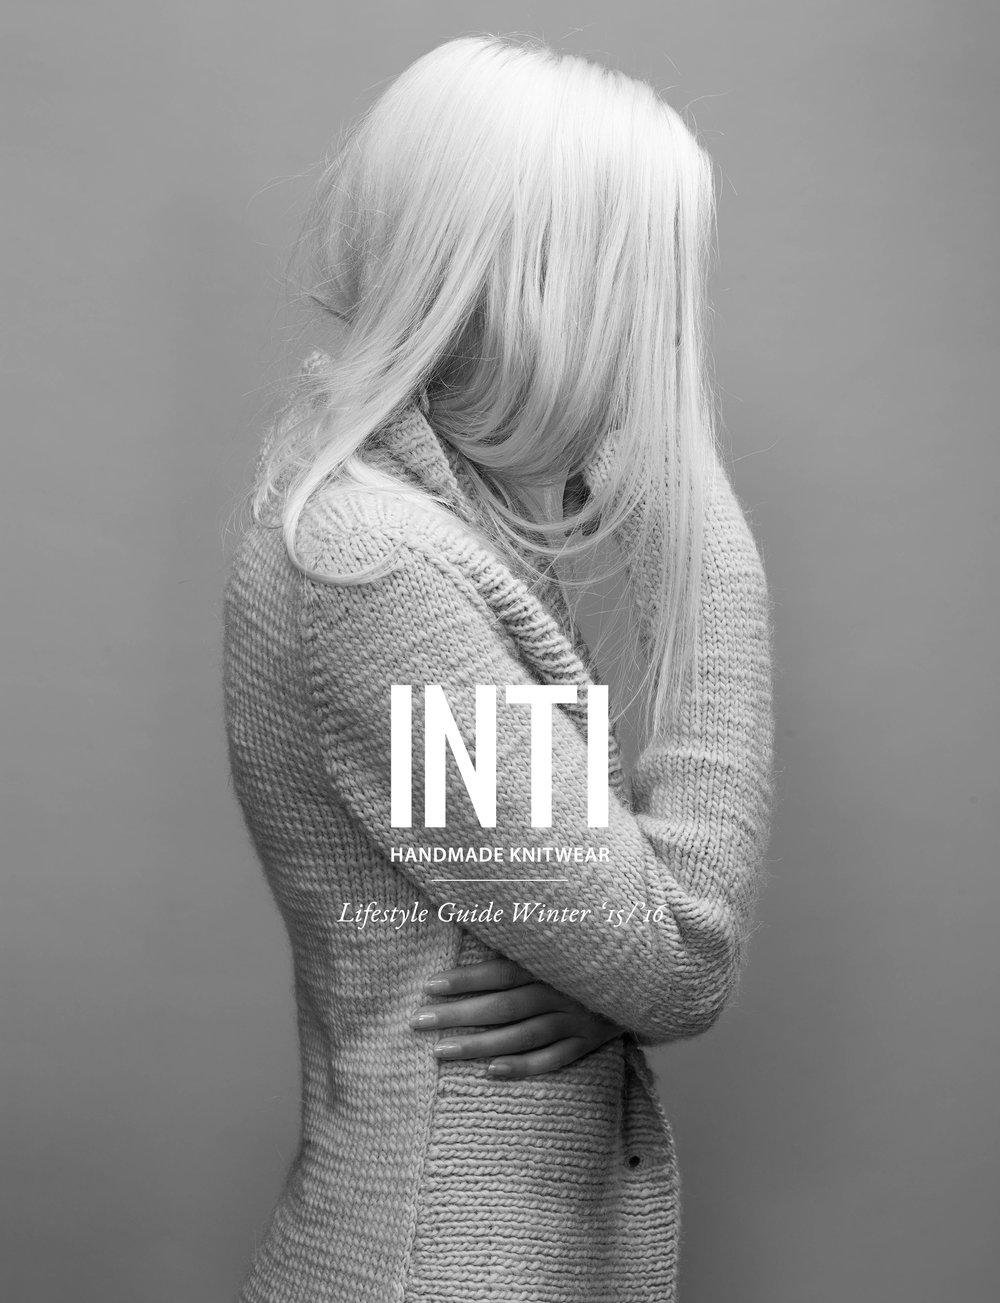 INTI Knitwear | Anna Cales & Leon van den Broek